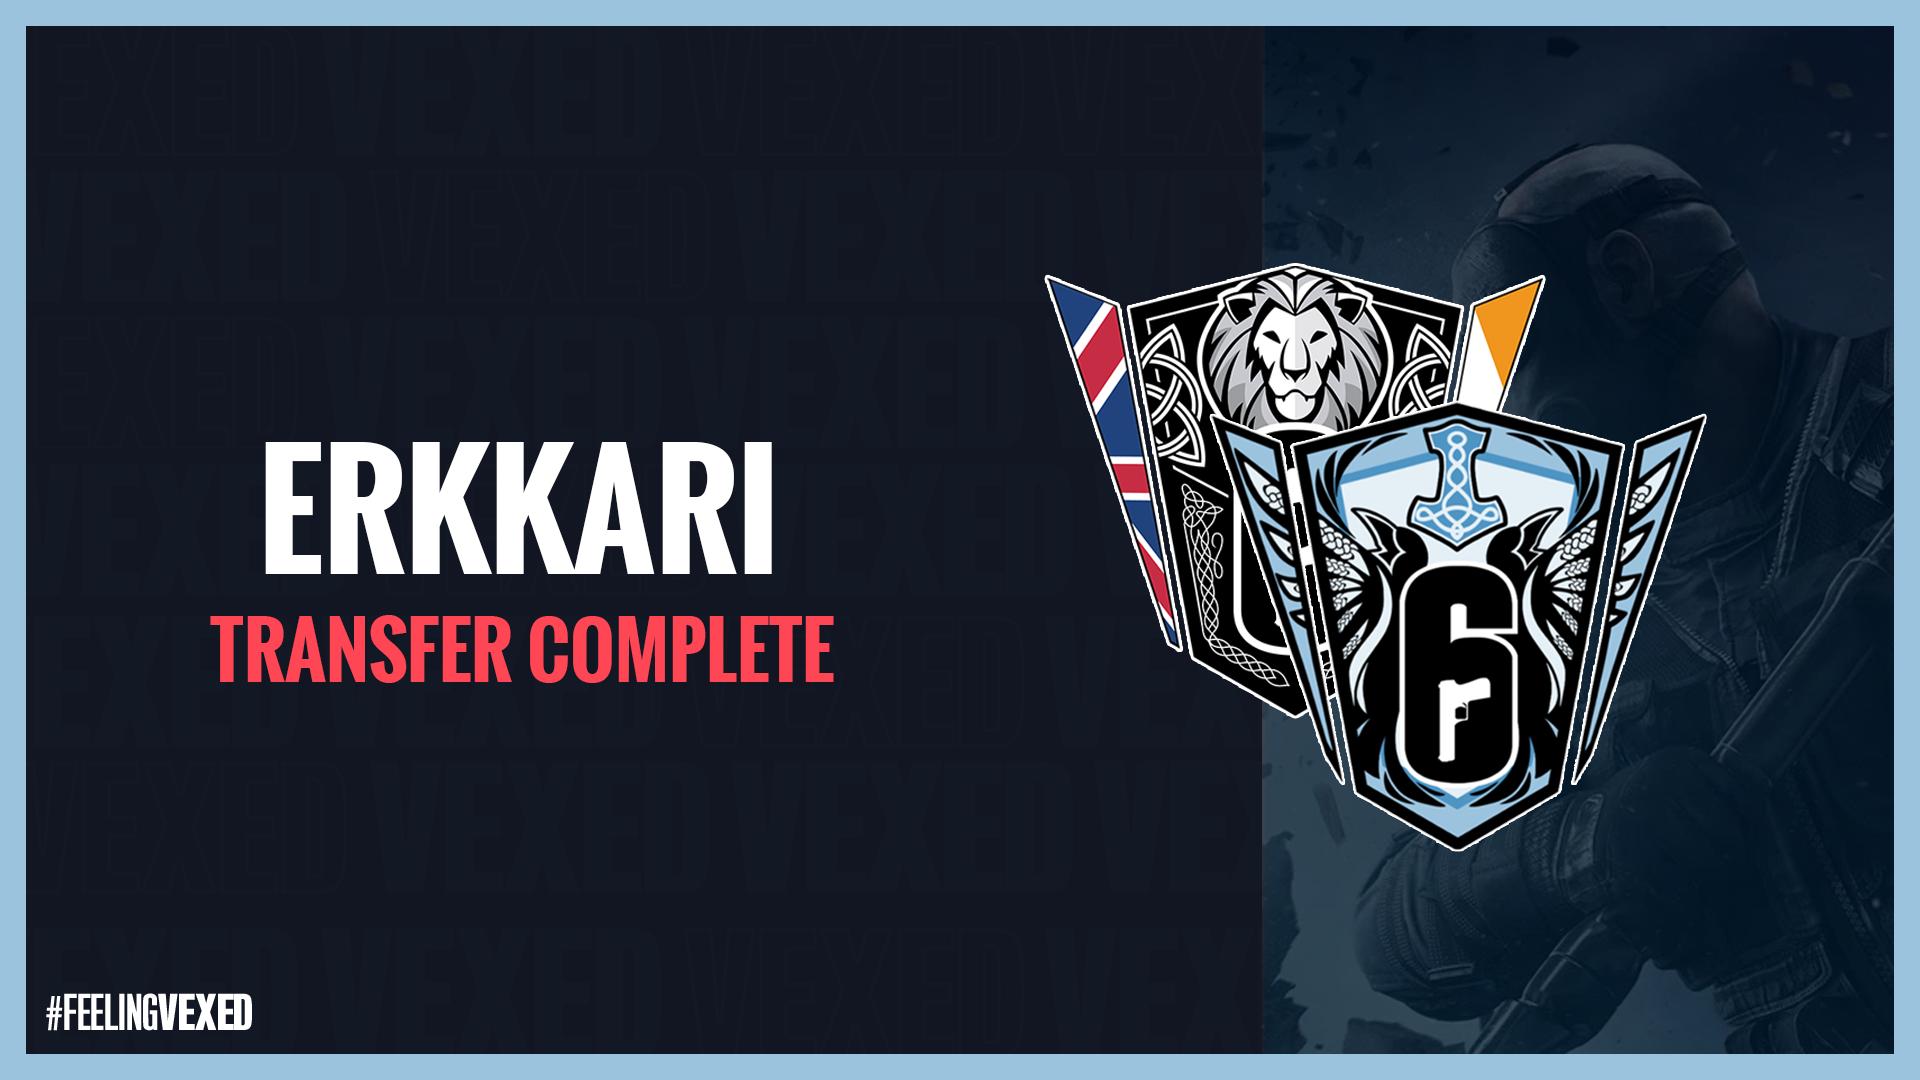 ERKKARI Transfered to Prima Esports Will play in Nordic Championships